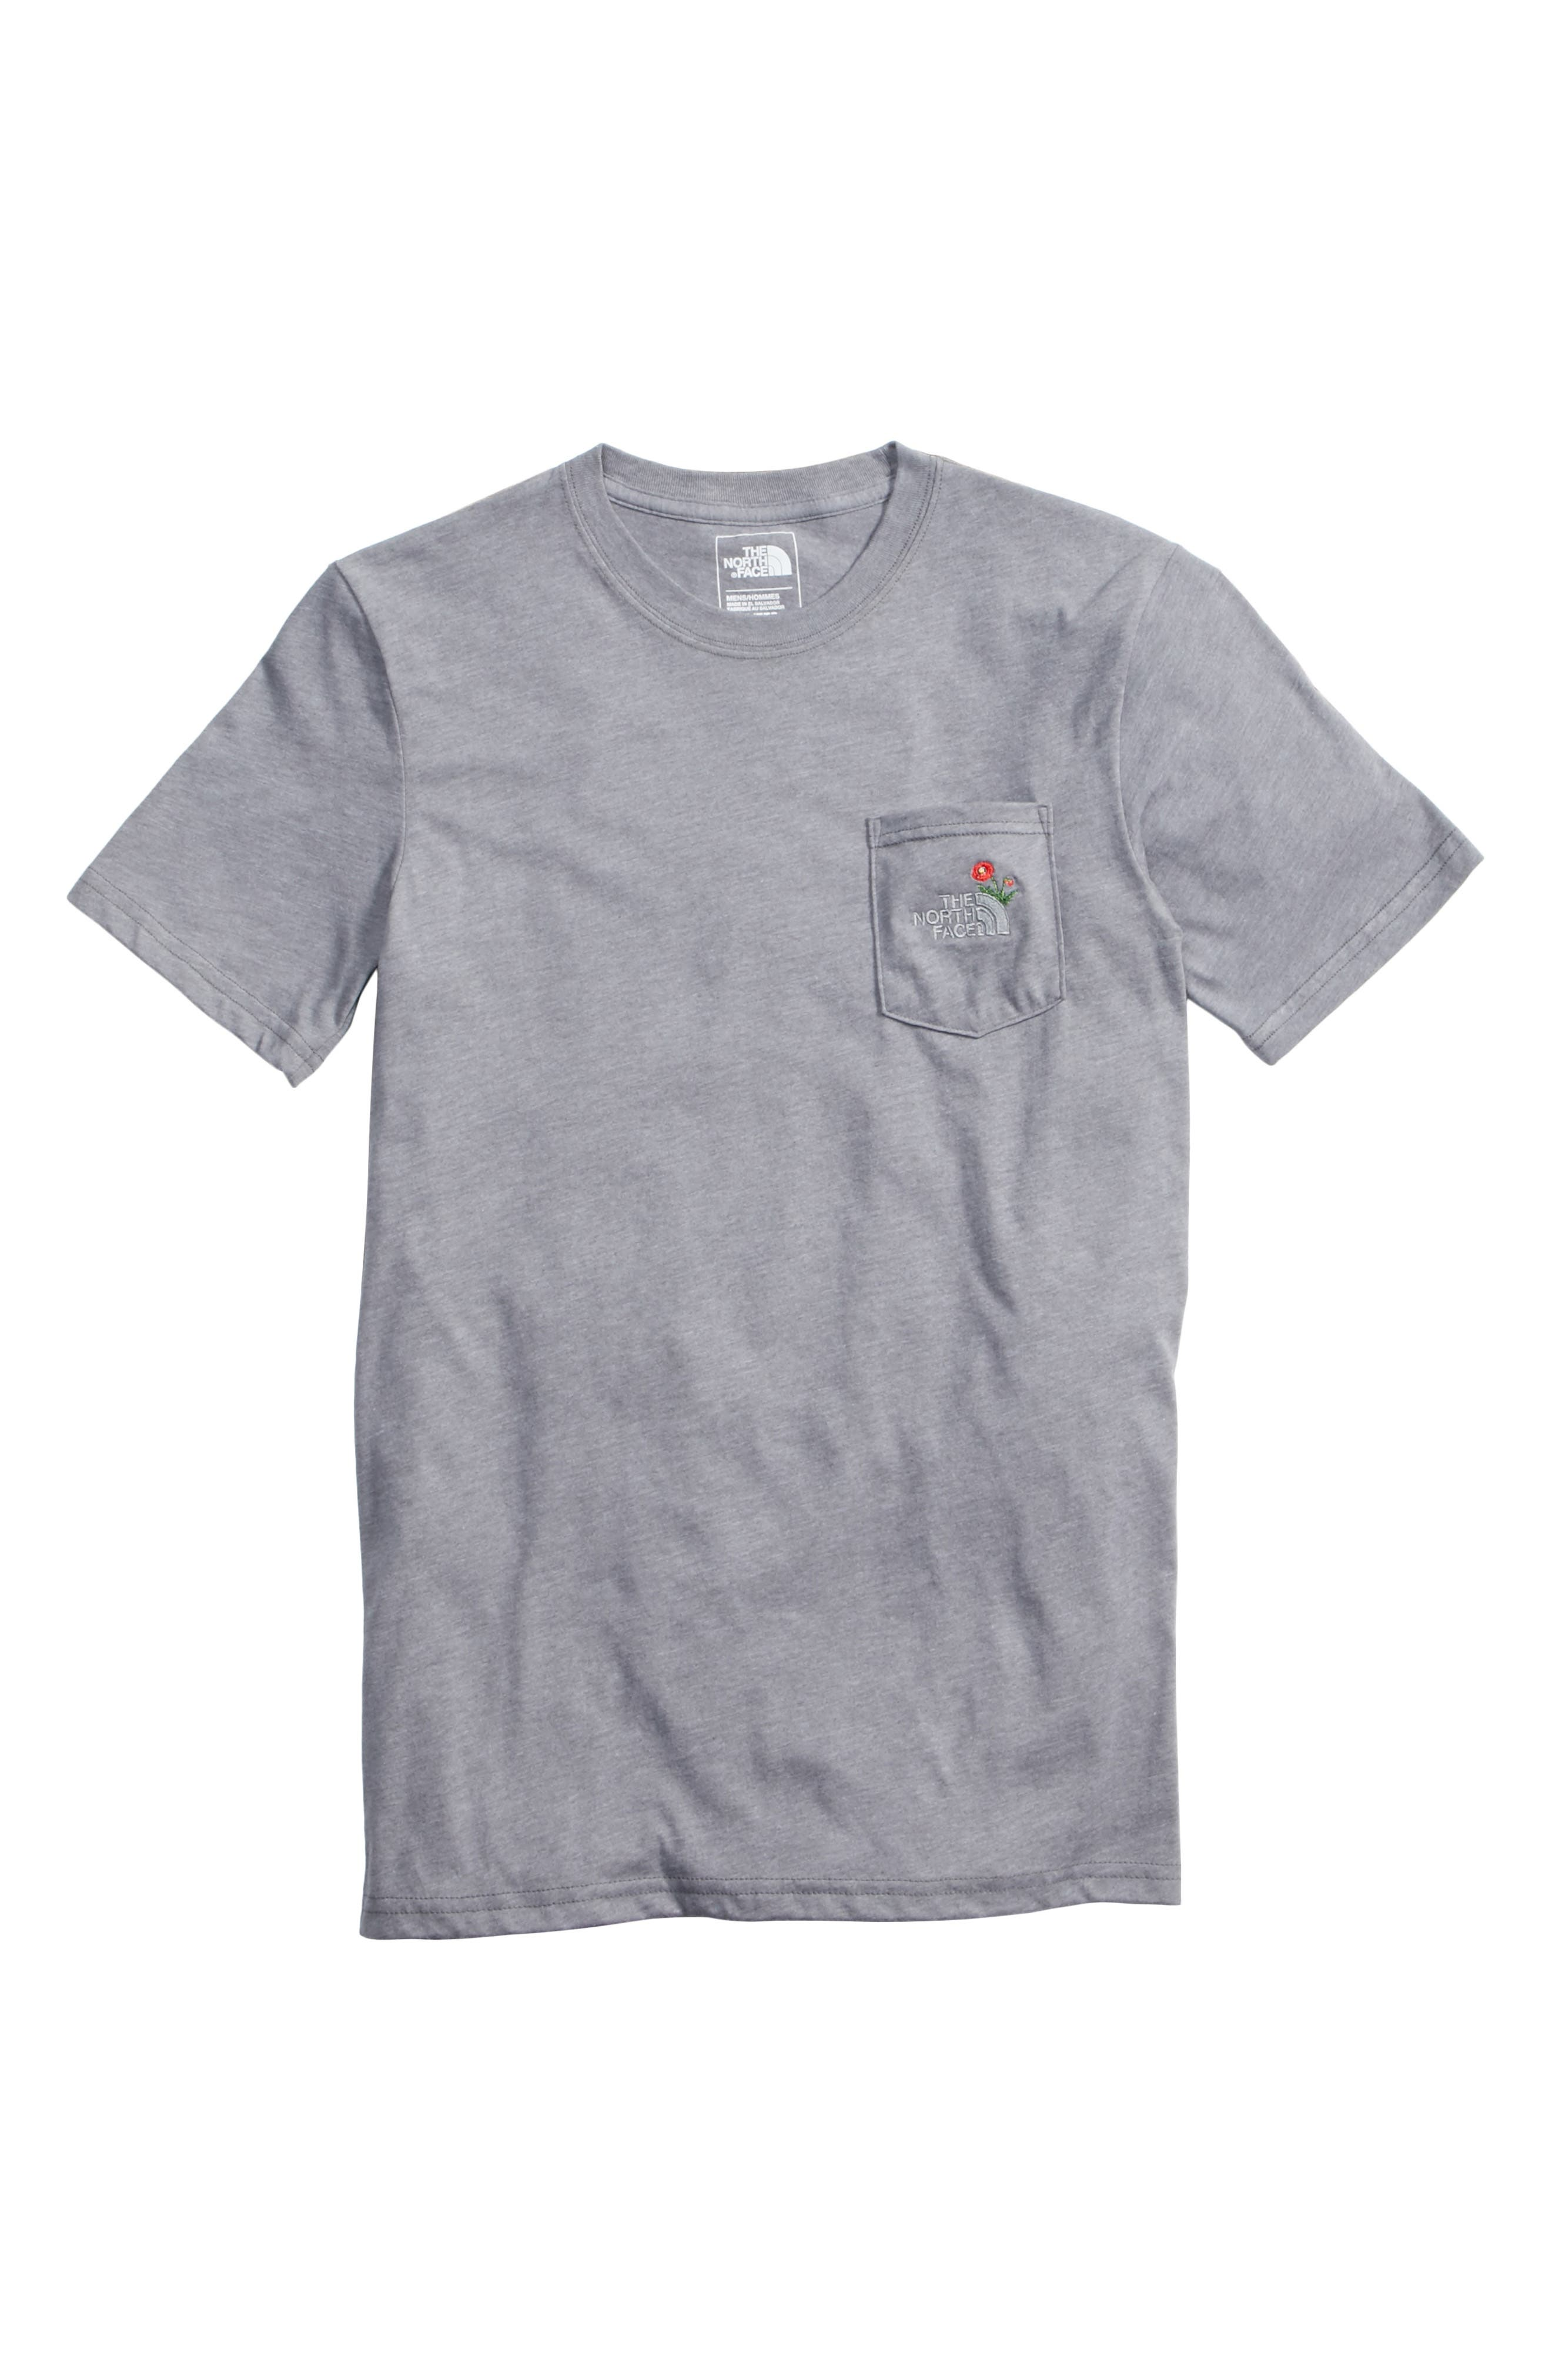 Unisex Pocket T-Shirt,                             Alternate thumbnail 6, color,                             030